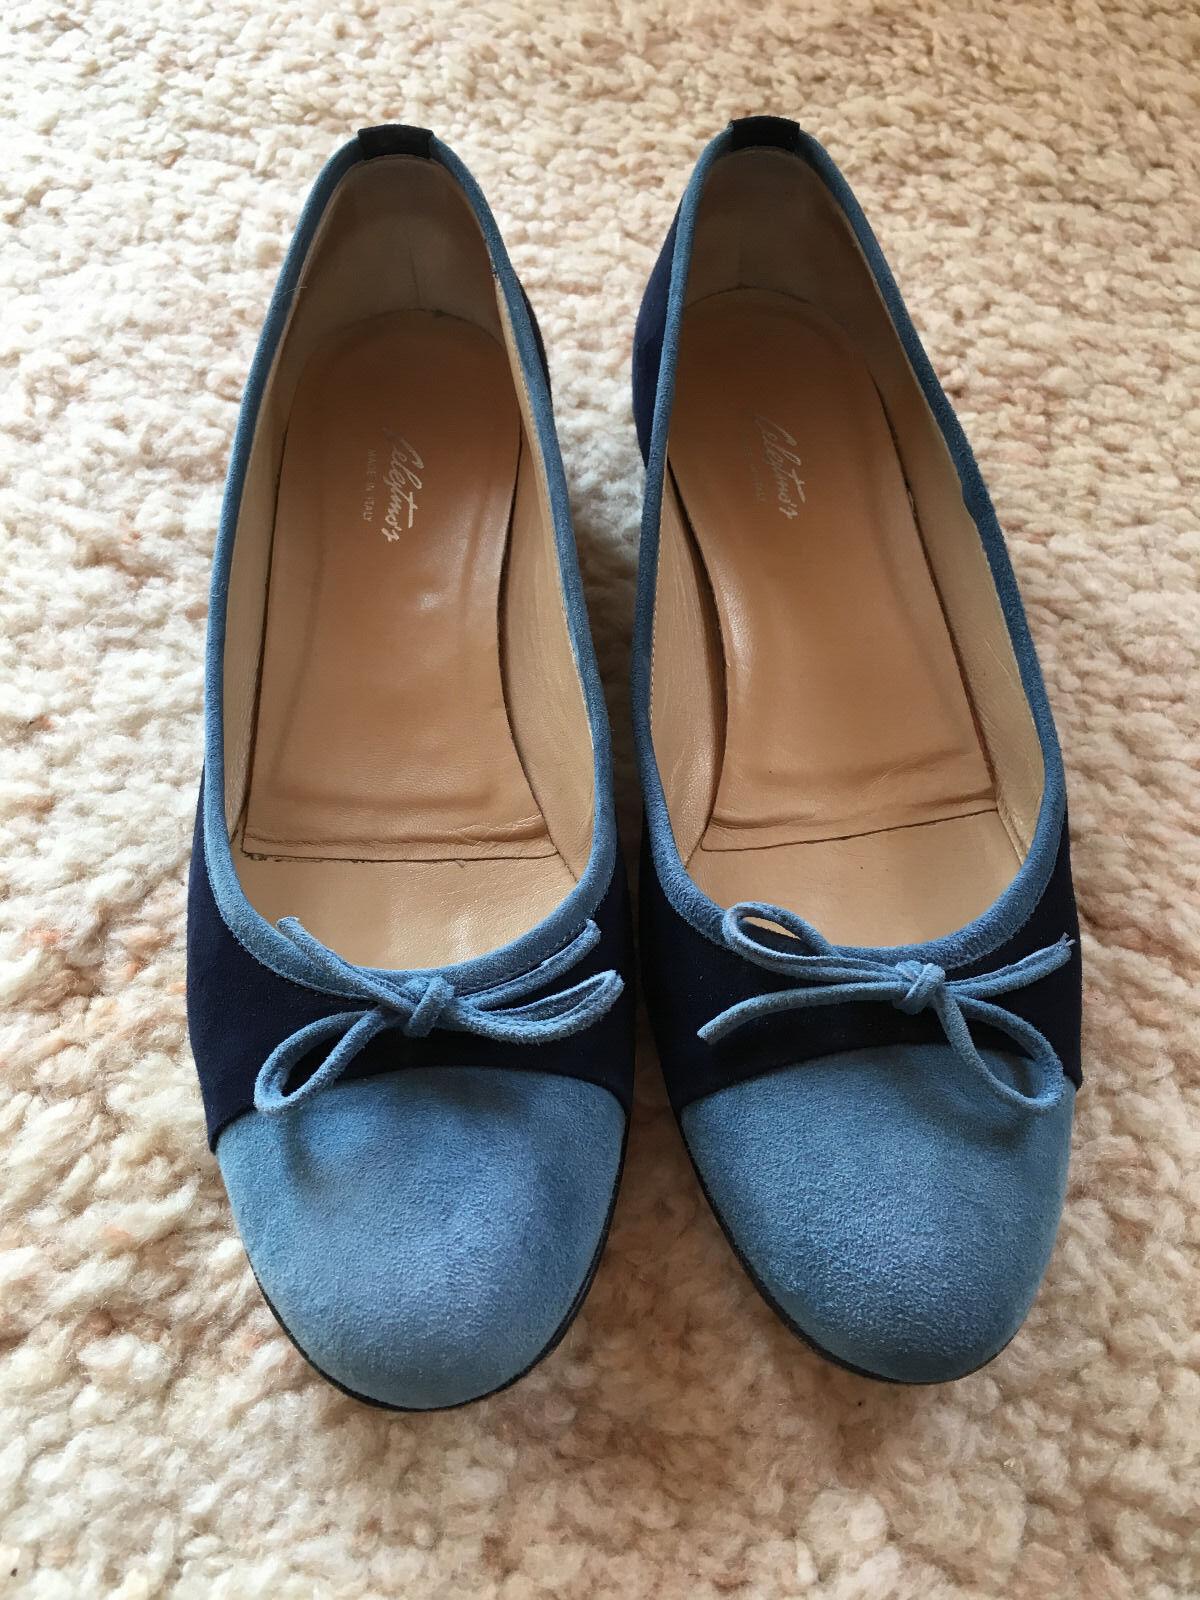 Damenschuhe Ballerinas Slipper Halbschuhe CELESTINO'S Echtleder Blau Größe 42 42 42 f4ebb6